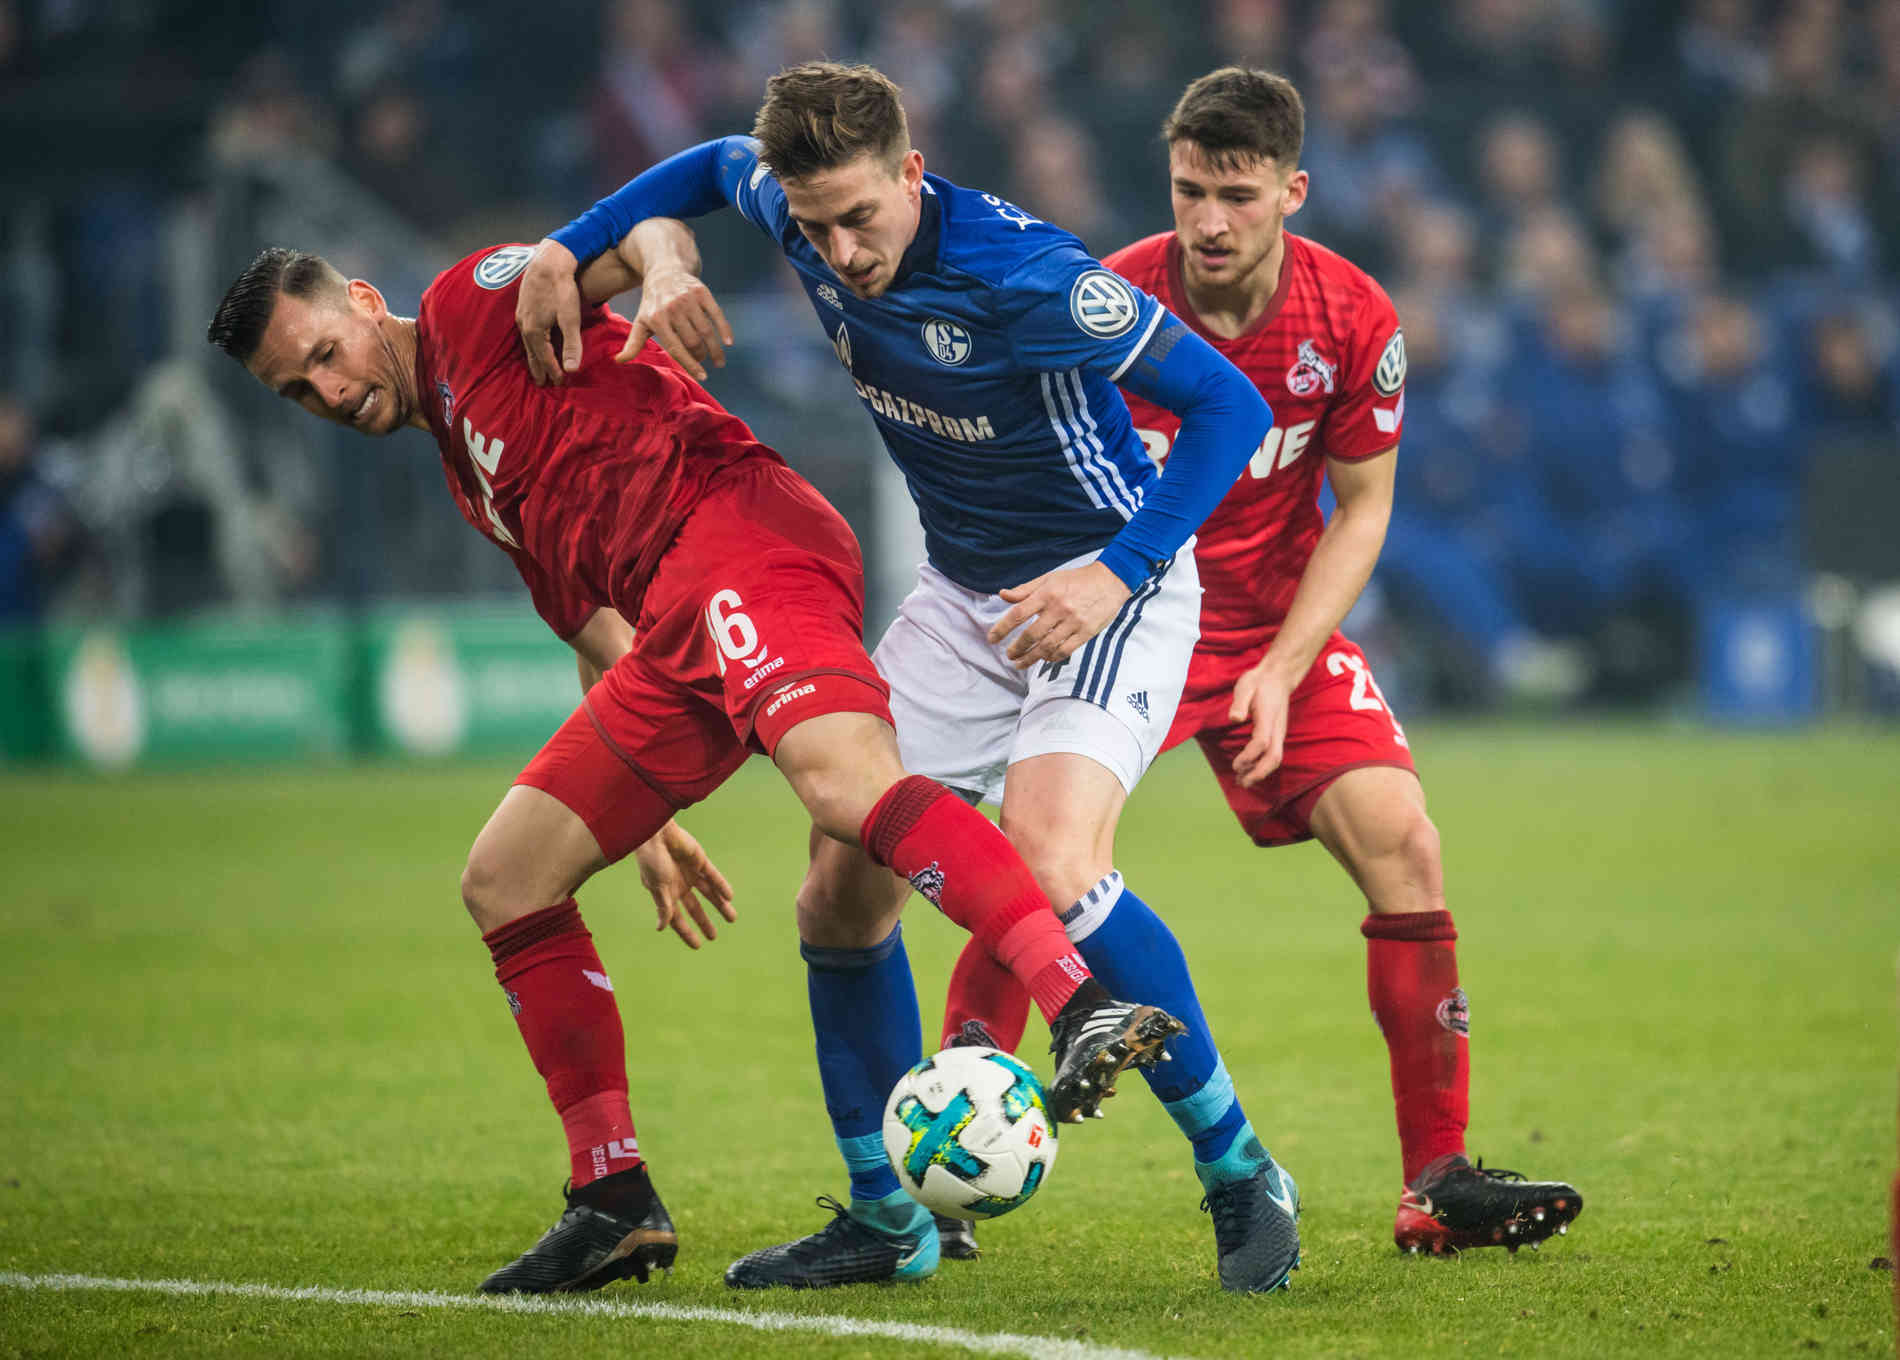 Pokalspiel Schalke Köln